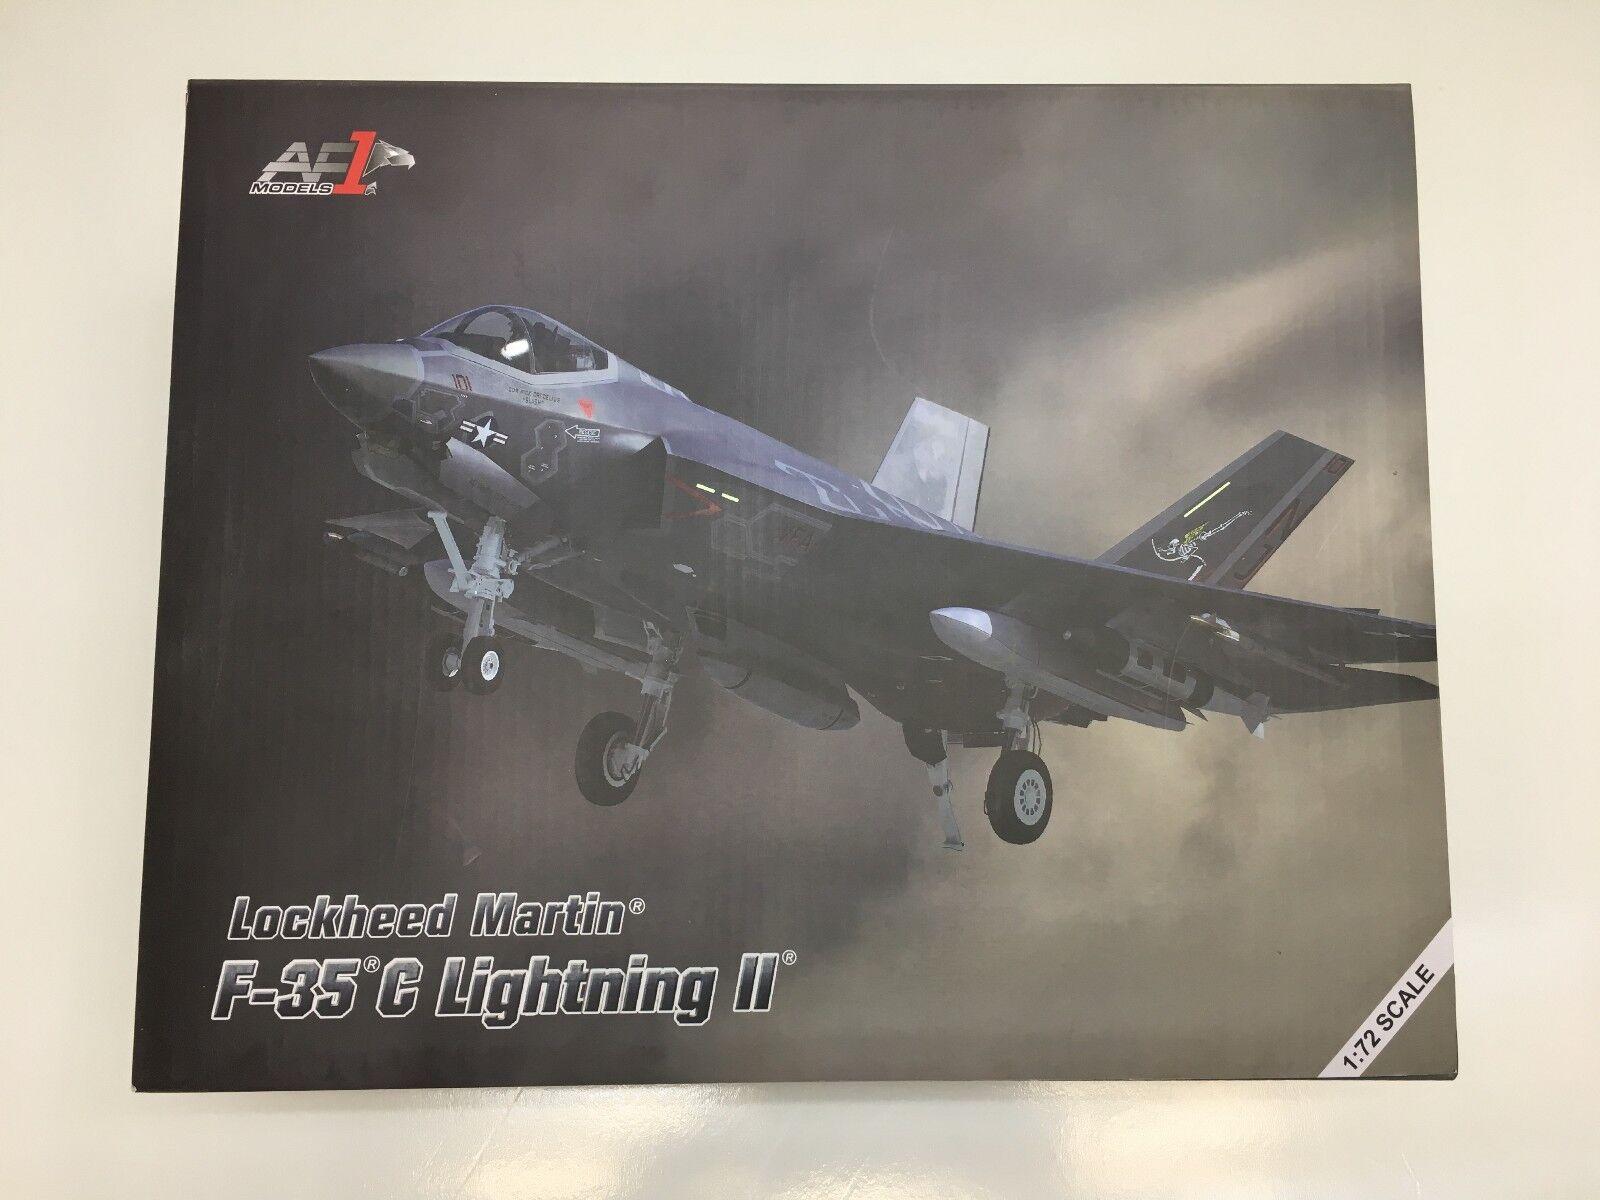 mejor calidad Air Force 1 AF1-0010A, Lockheed Martin F-35C Lightning Ii, 1 1 1 72  genuina alta calidad